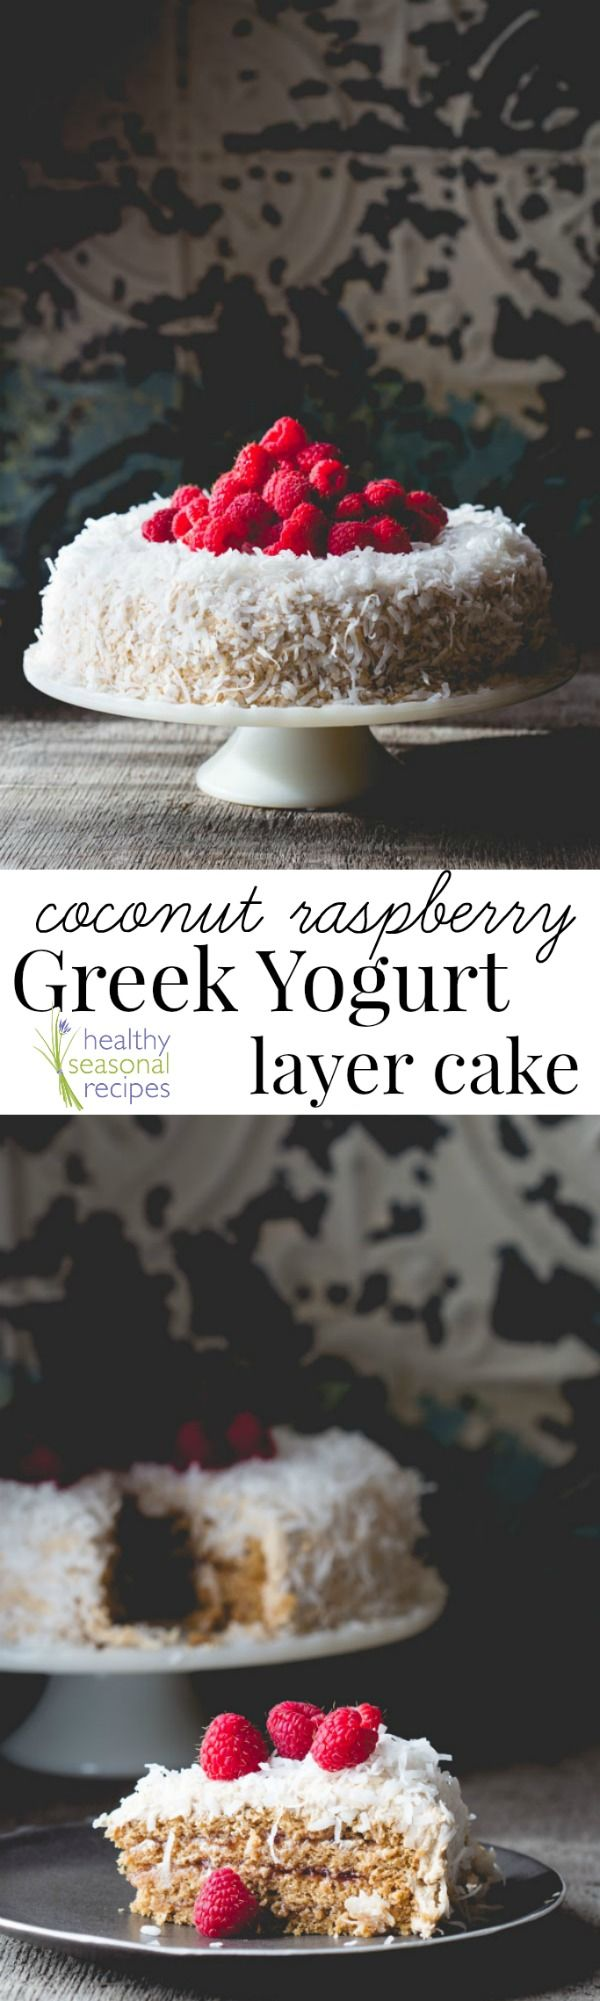 coconut raspberry greek yogurt layer cake - Healthy Seasonal Recipes